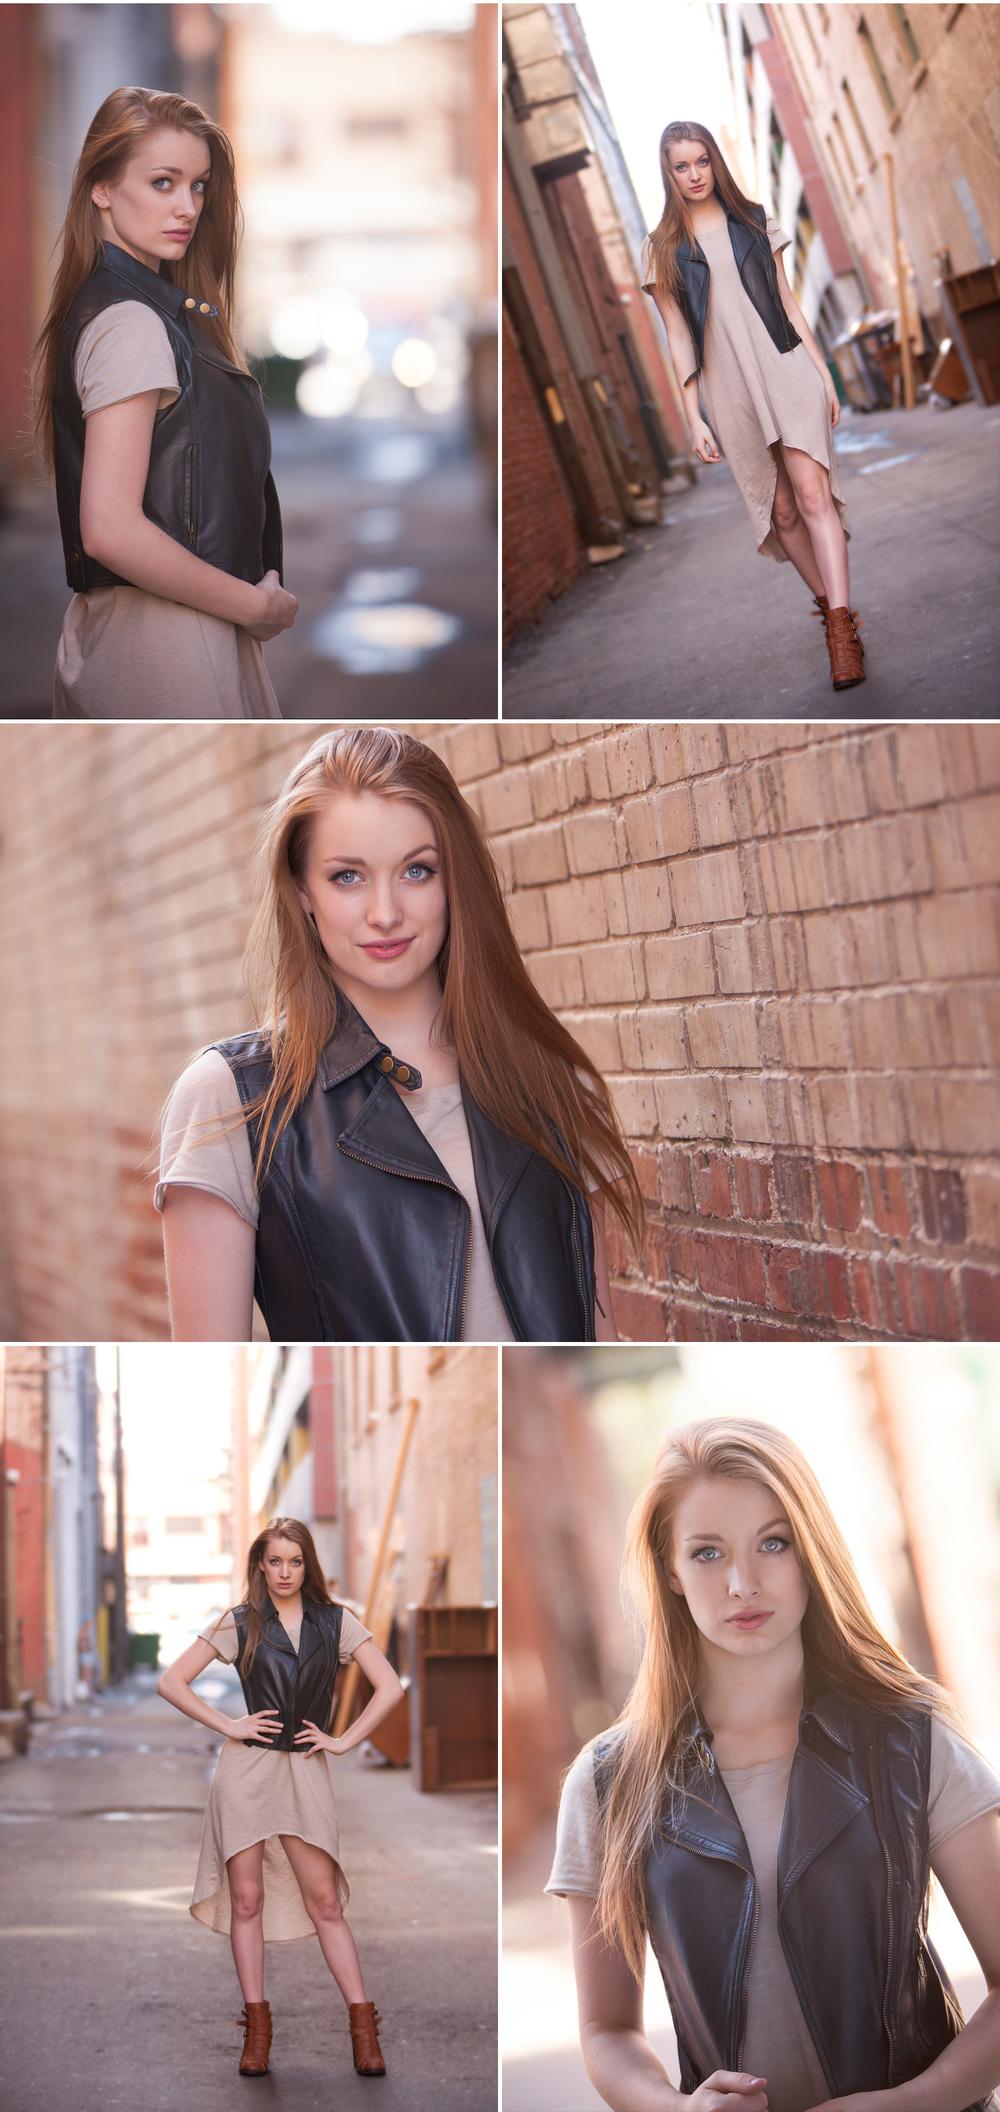 Senior Pictures in Urban Alley, Denver, Merritt Portrait Studio